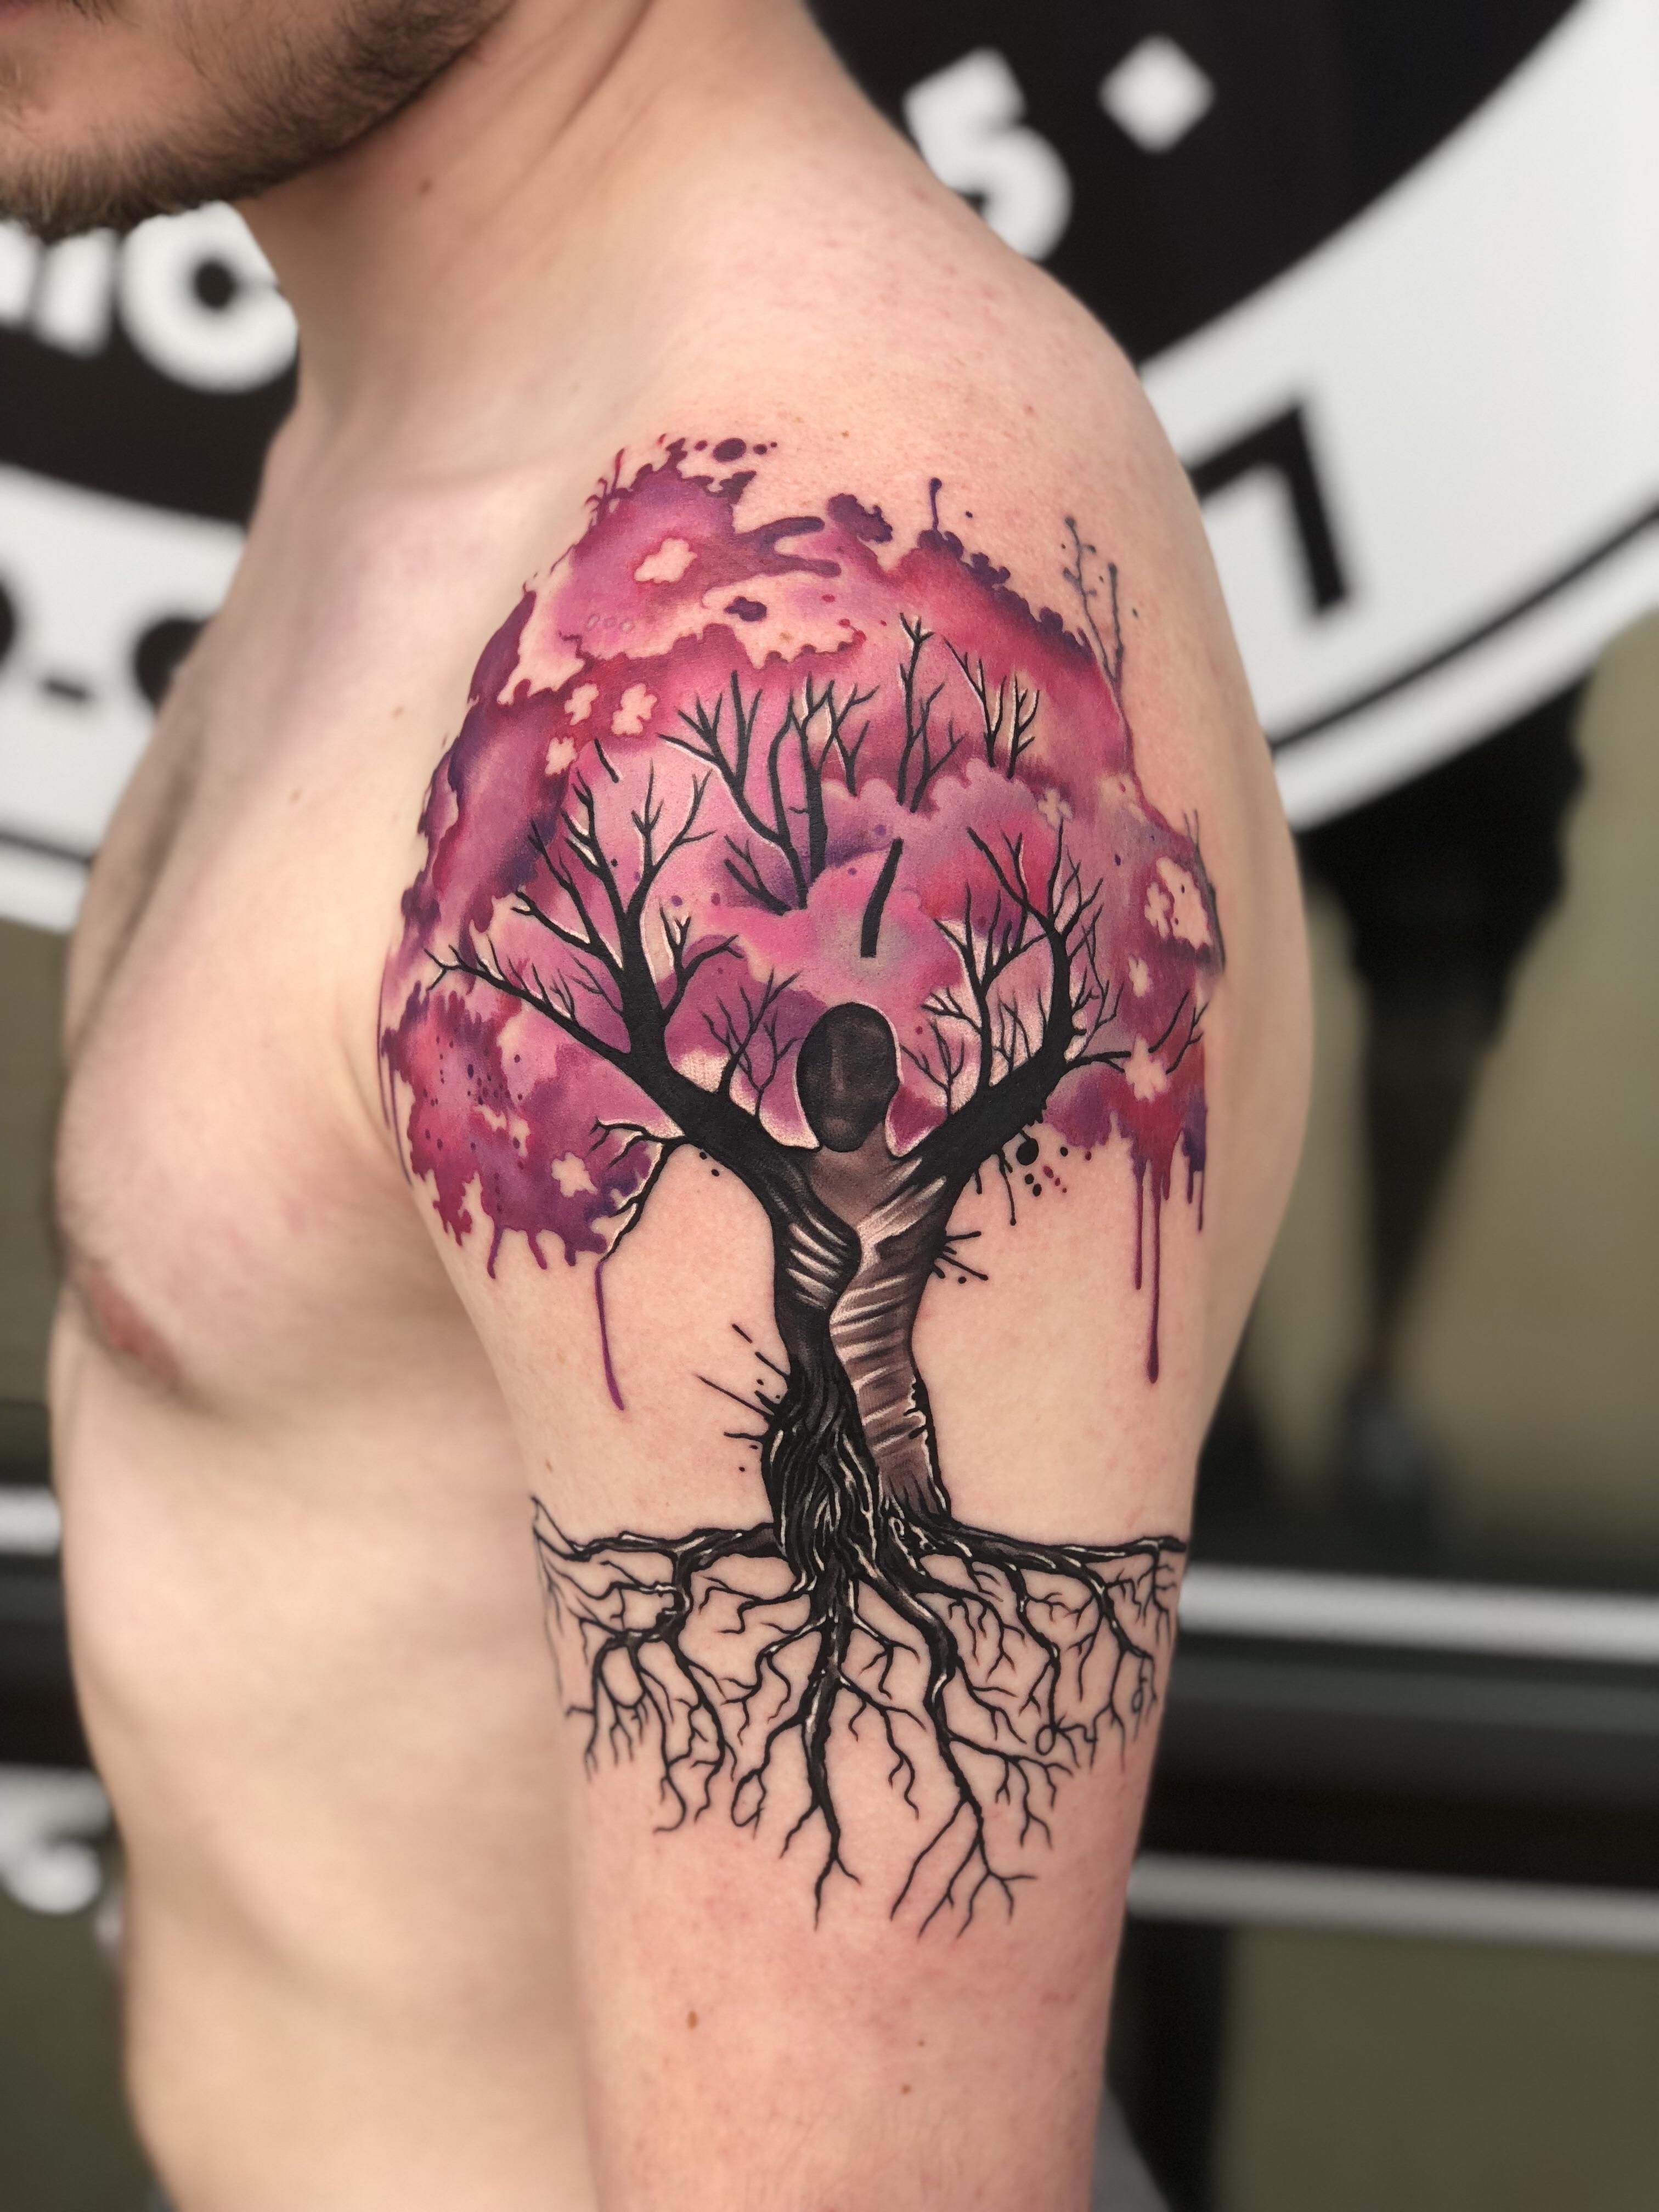 Neon Dragon Tattoos : dragon, tattoos, Watercolor, Dogwood, Mural, Tyler, (Neon, Dragon, Tattoo,, Cedar, Rapids,, Tattoos